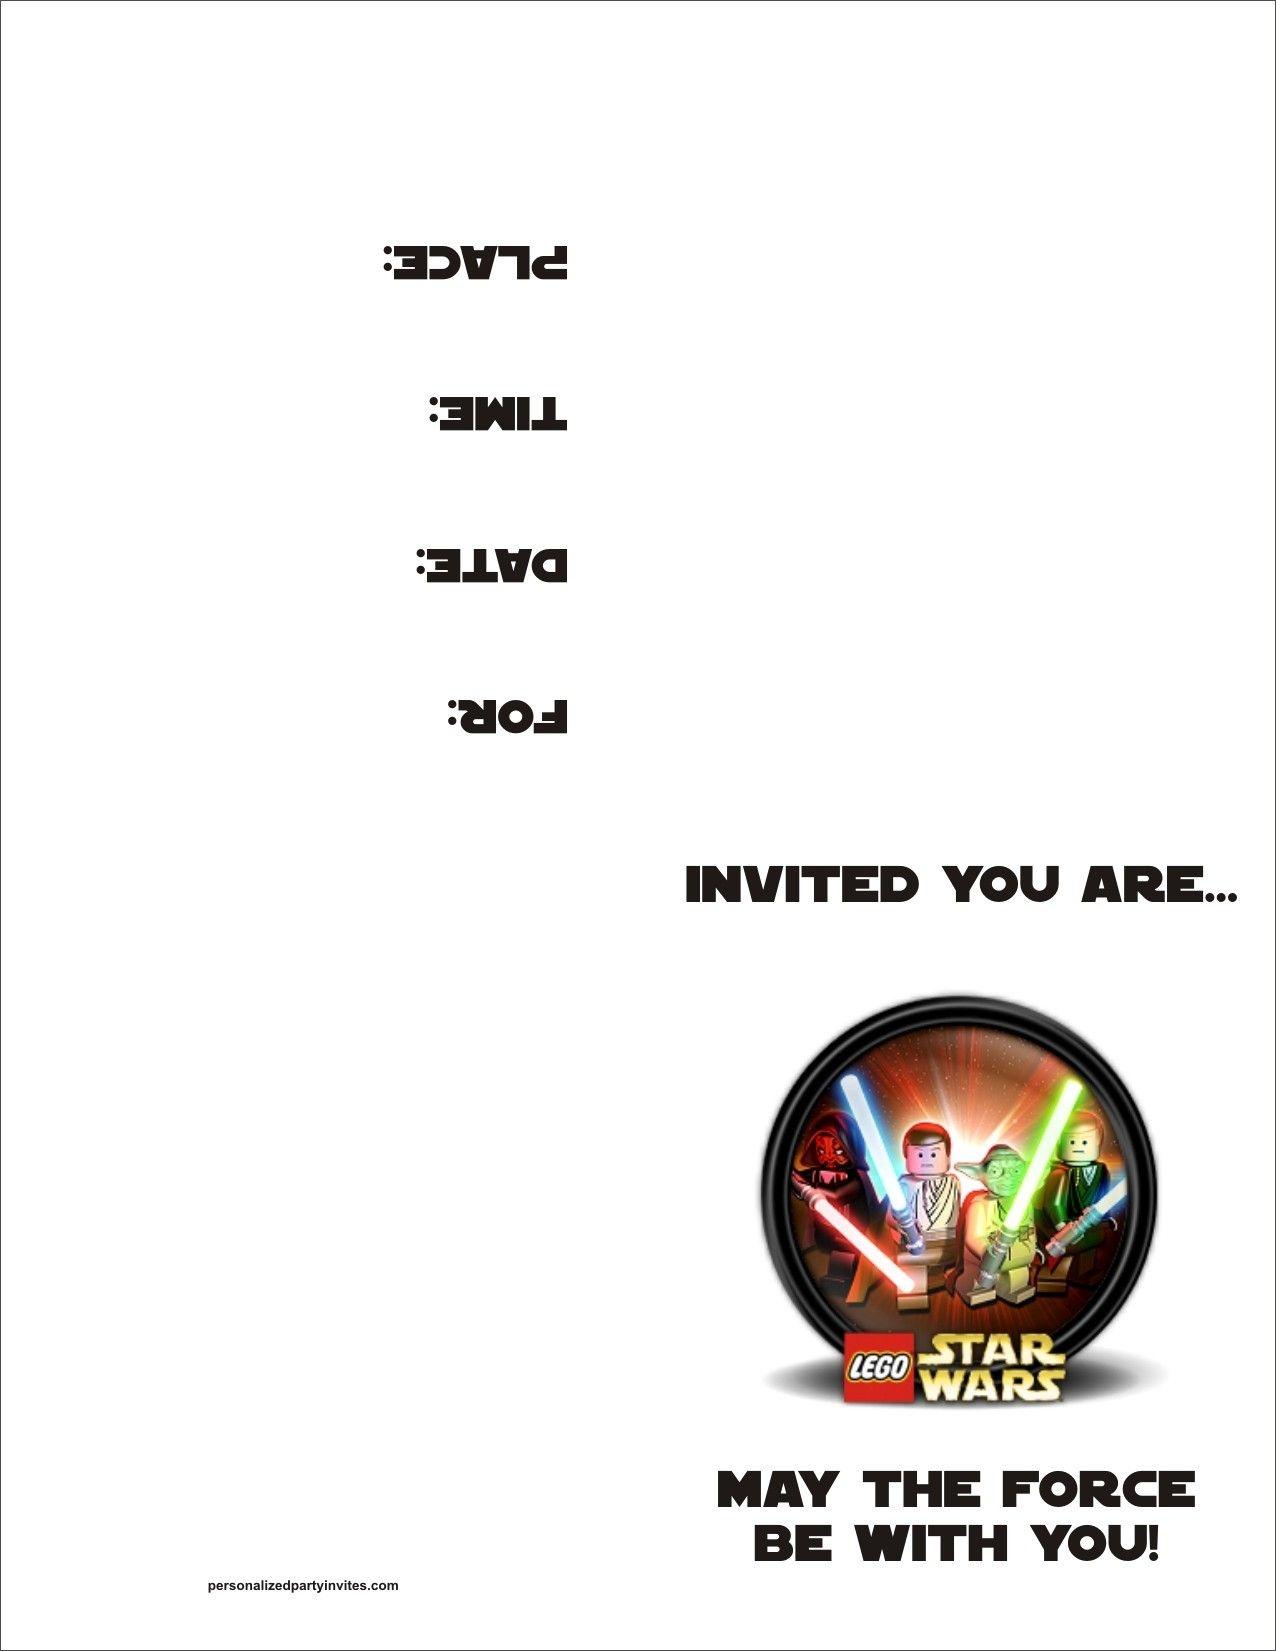 Lego+Star+Wars+Party+Invitations+Printable+Free   Costume In 2019 - Star Wars Invitations Free Printable